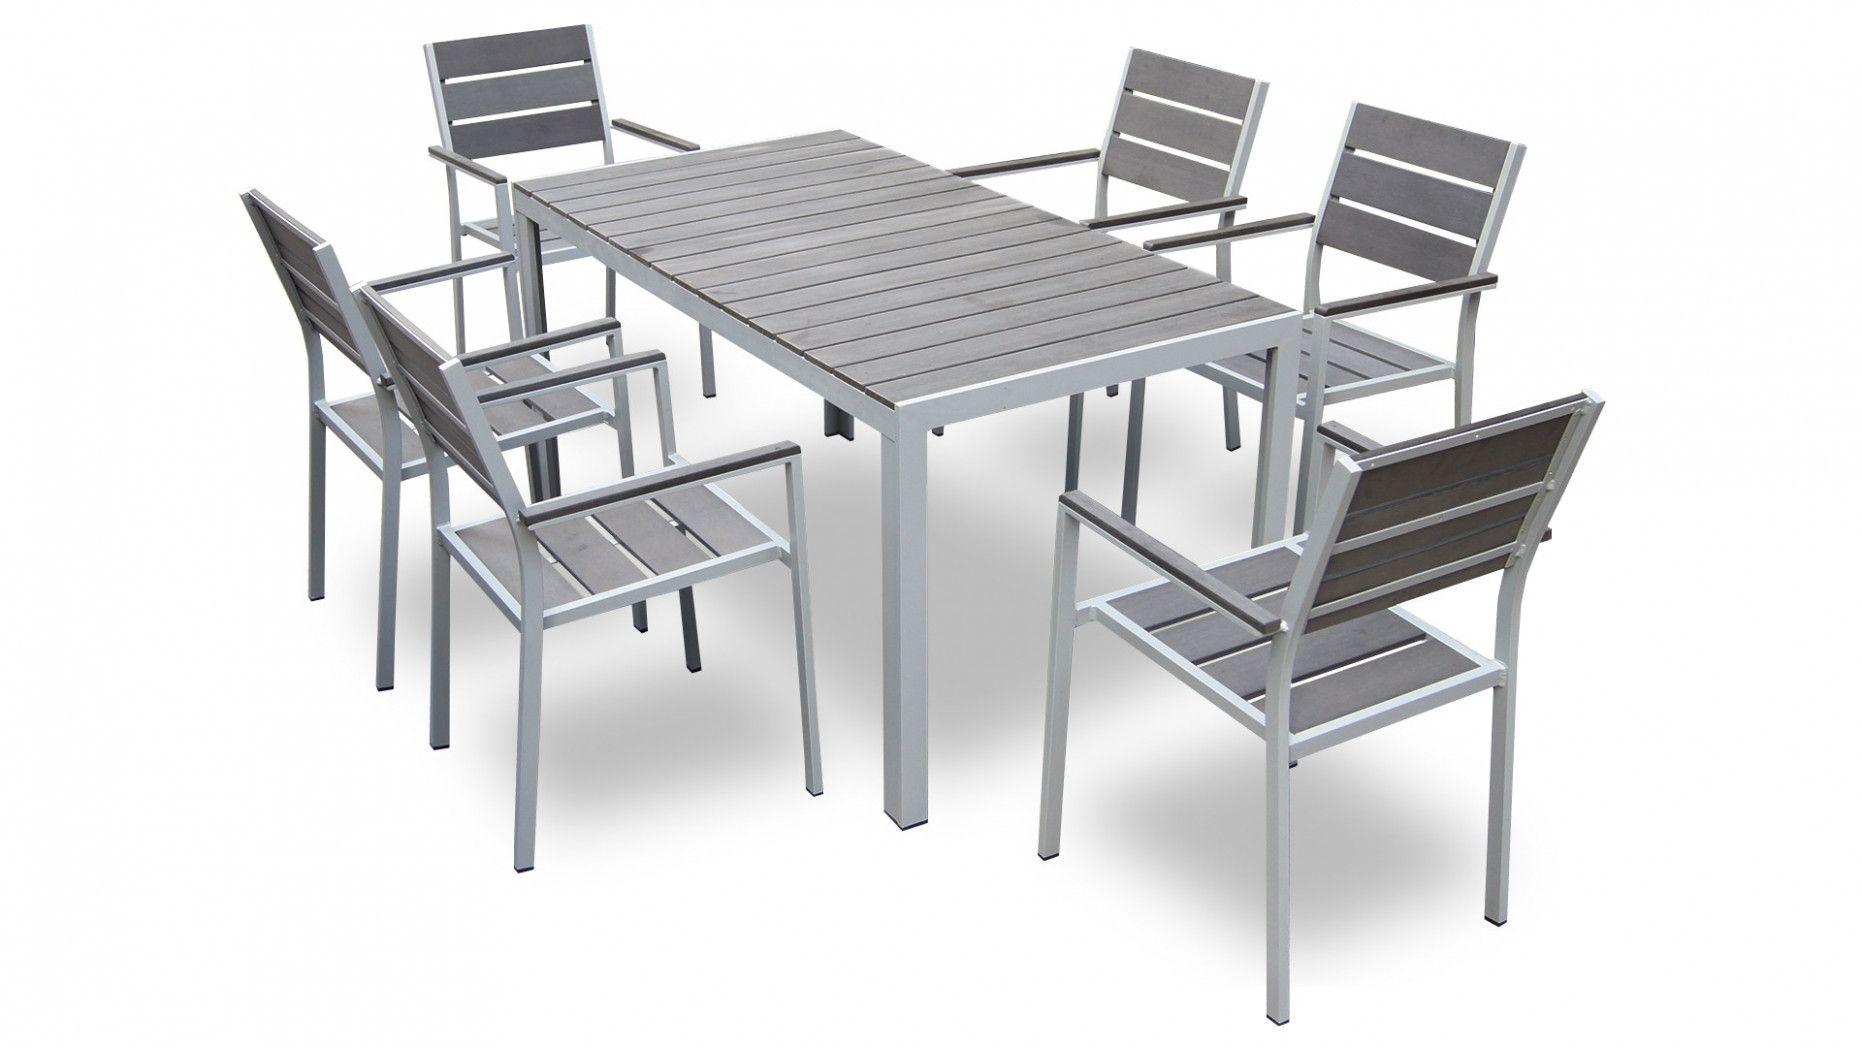 Table De Jardin Fermob Soldes Outdoor Furniture Sets Outdoor Furniture Home Decor